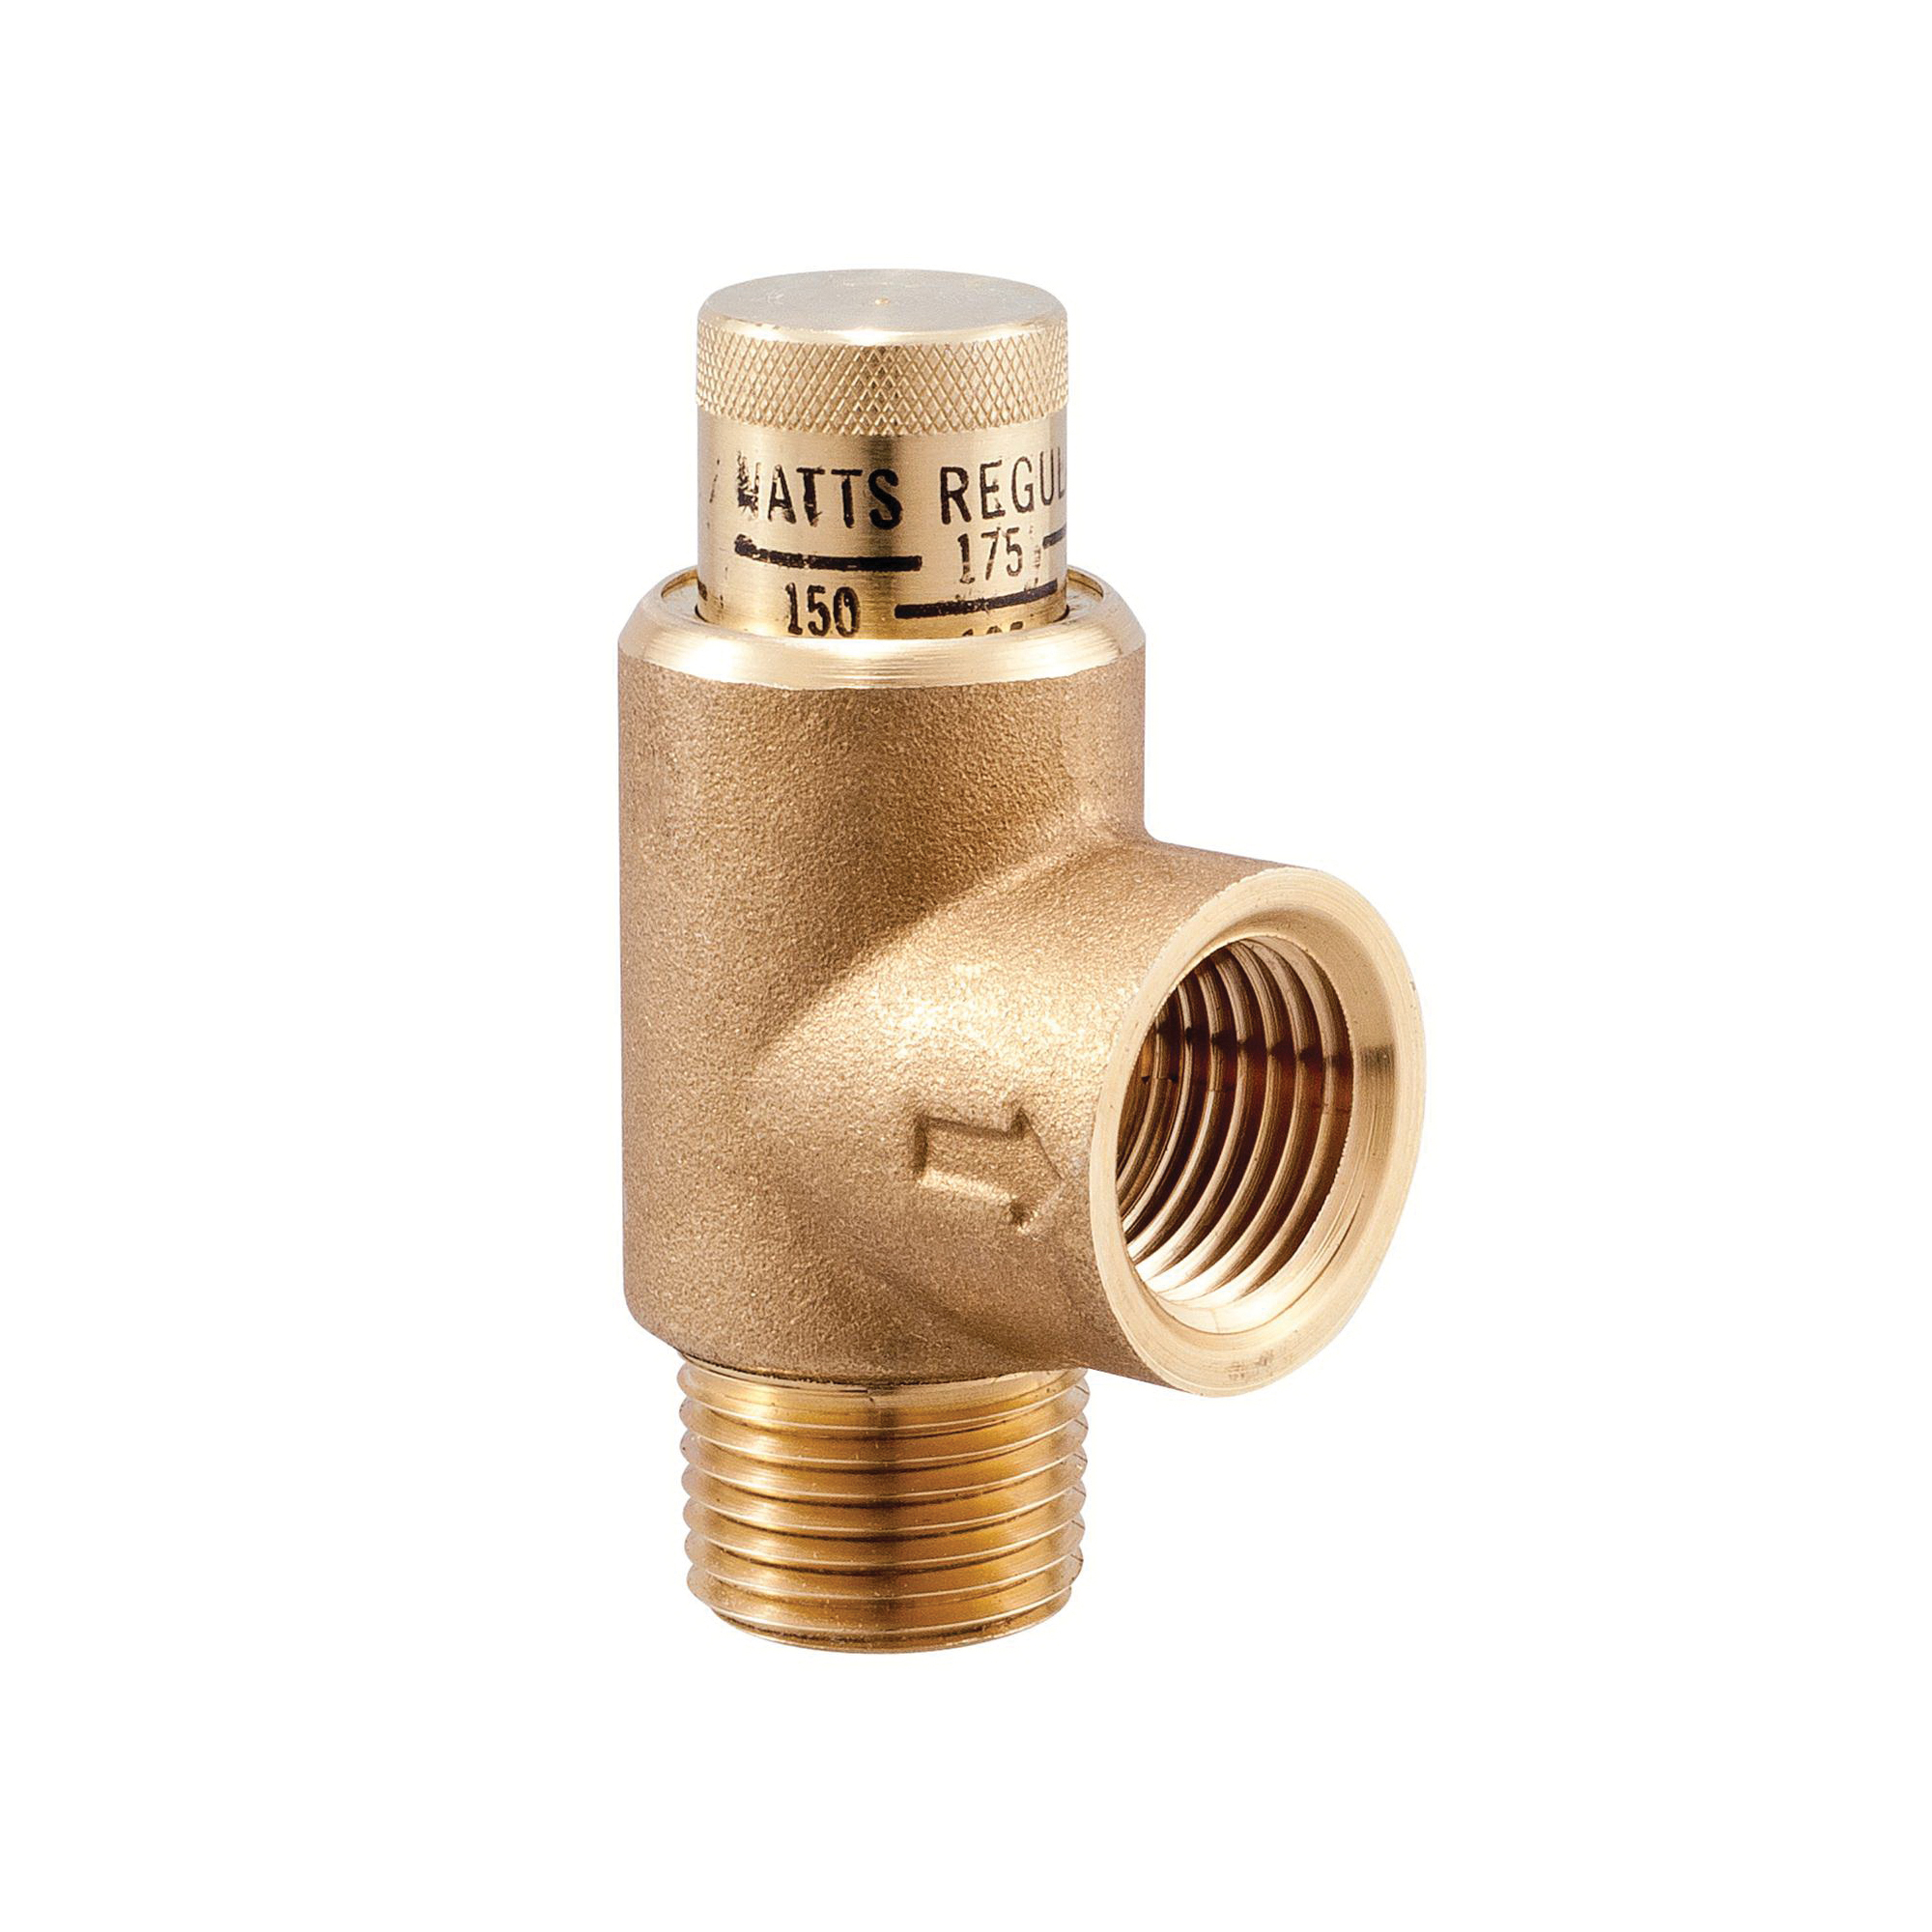 WATTS® 0121626 LF530C Calibrated Pressure Relief Valve, 3/4 in, MNPT x FNPT, 100 to 300 psi, Brass Body